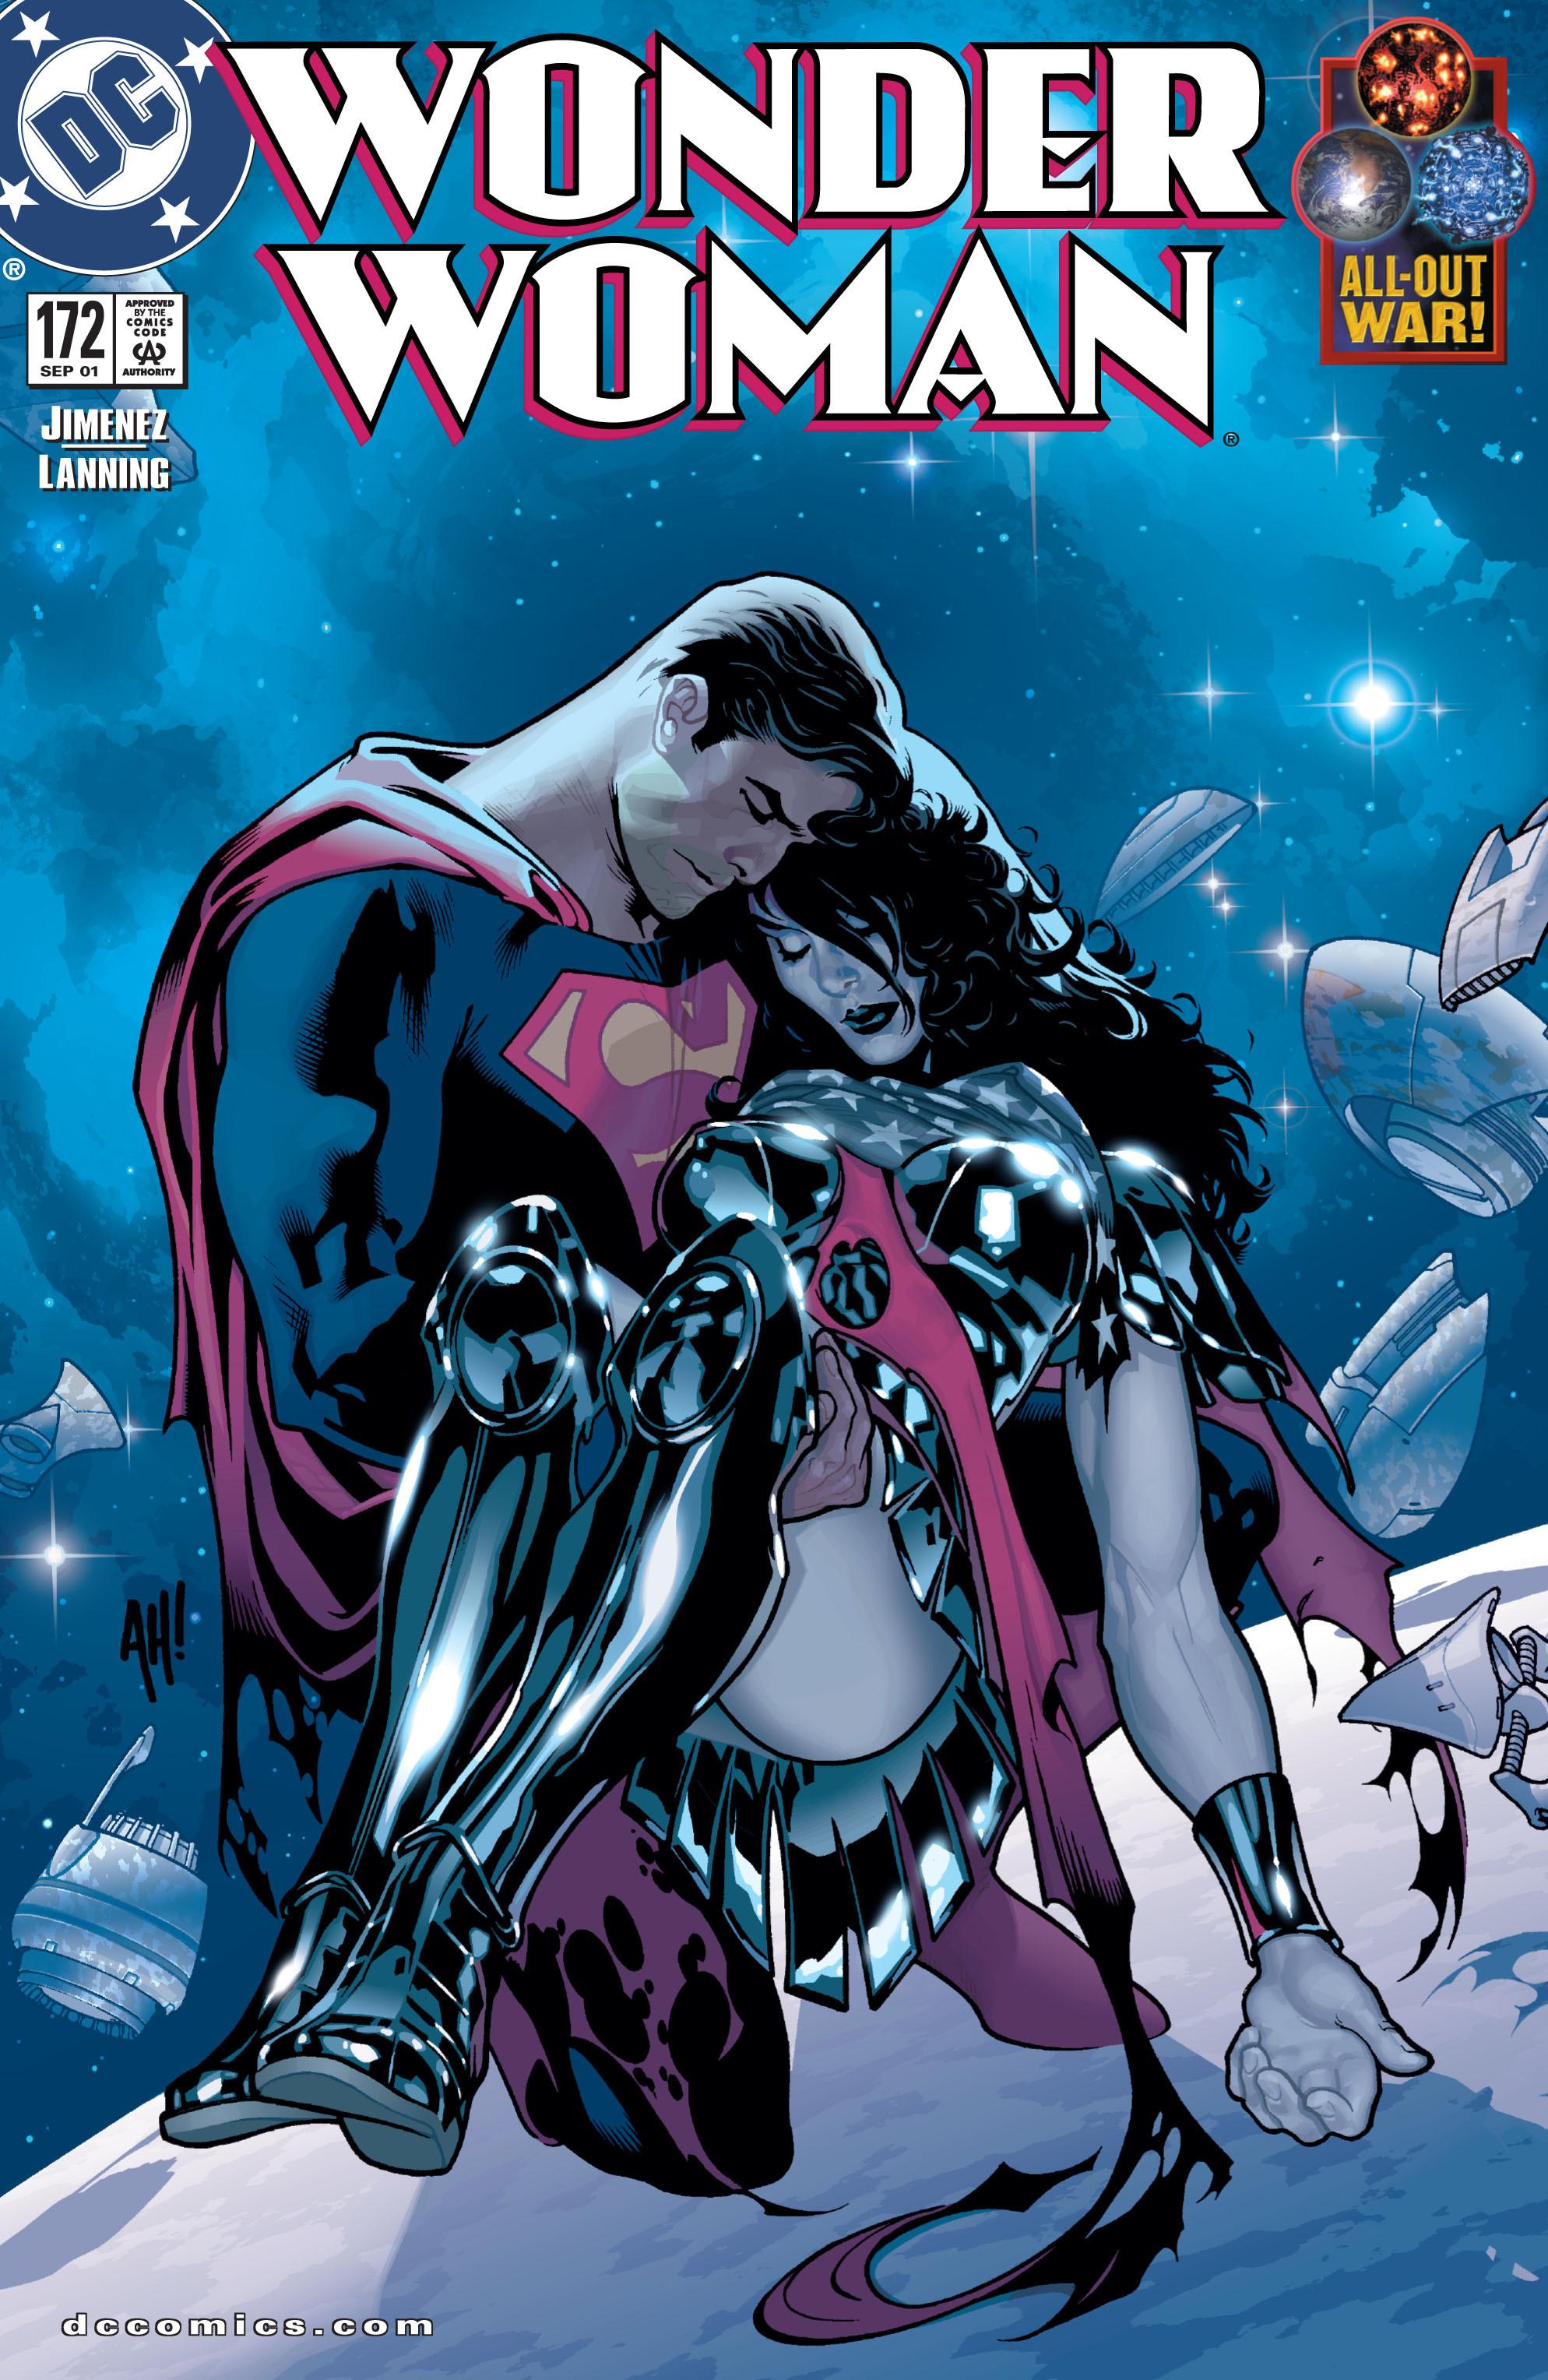 Read online Wonder Woman (1987) comic -  Issue #172 - 1